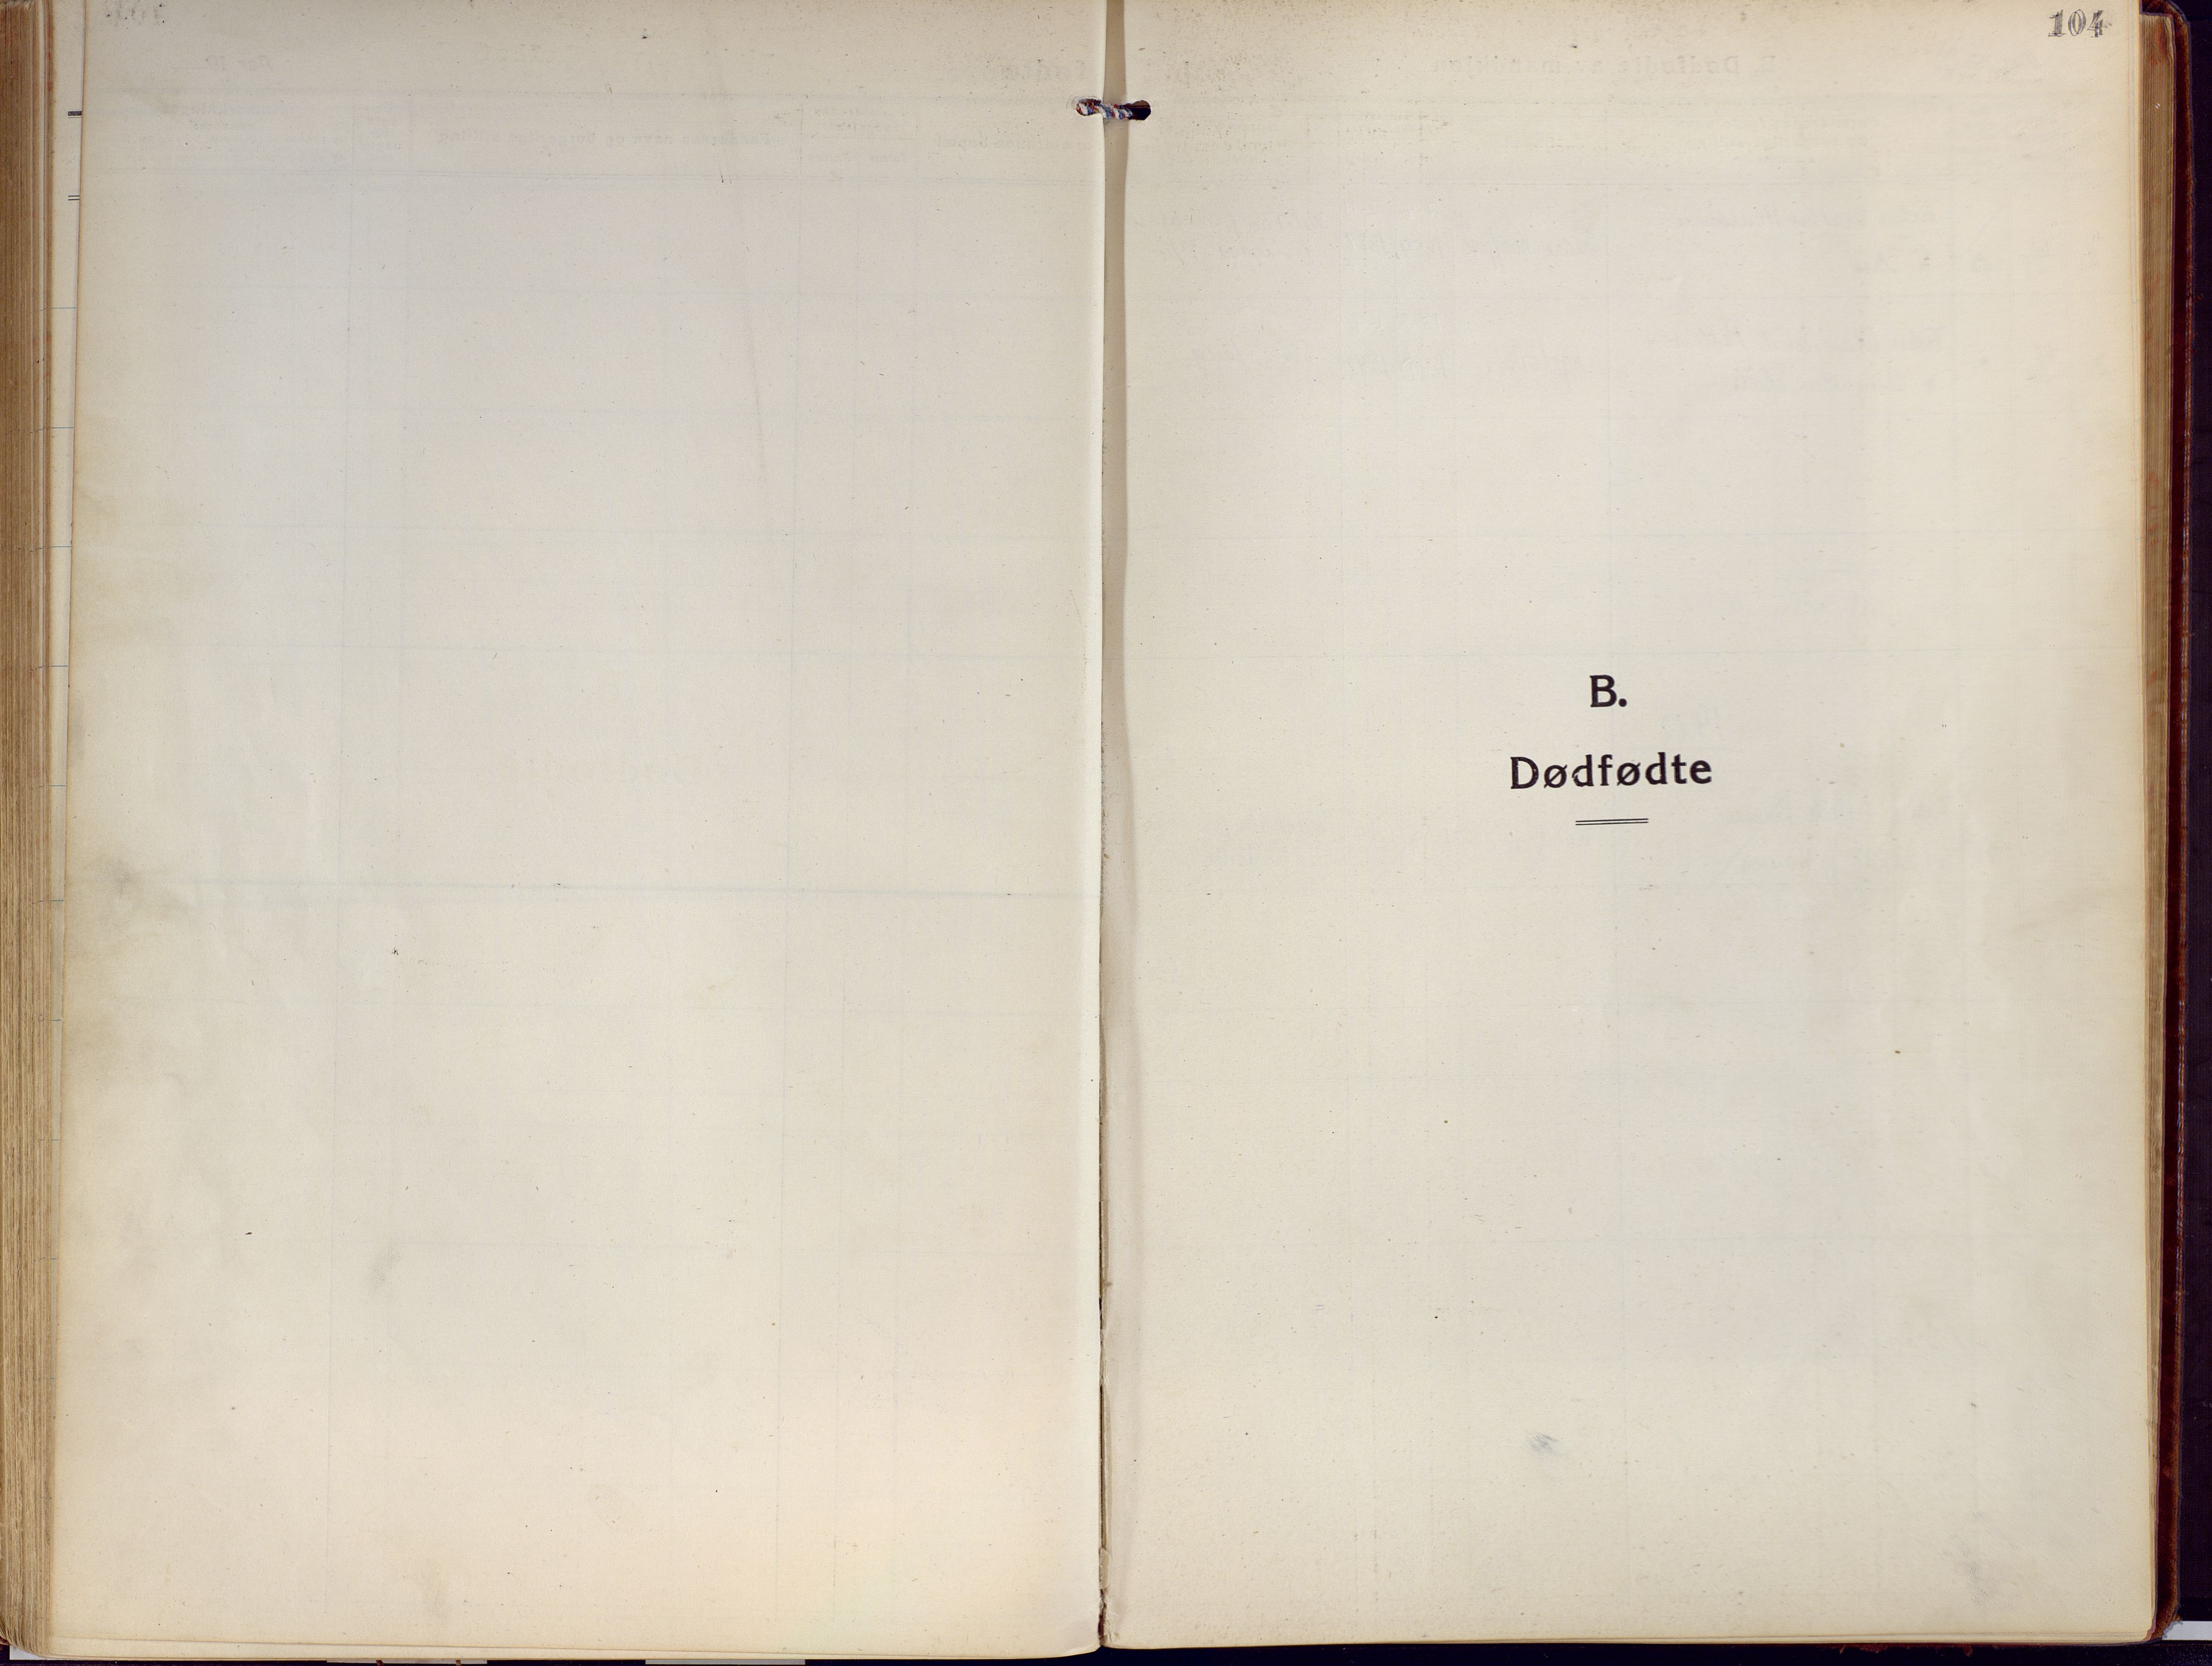 SATØ, Kjelvik/Nordkapp sokneprestkontor, H/Ha/L0002kirke: Ministerialbok nr. 2, 1920-1929, s. 104